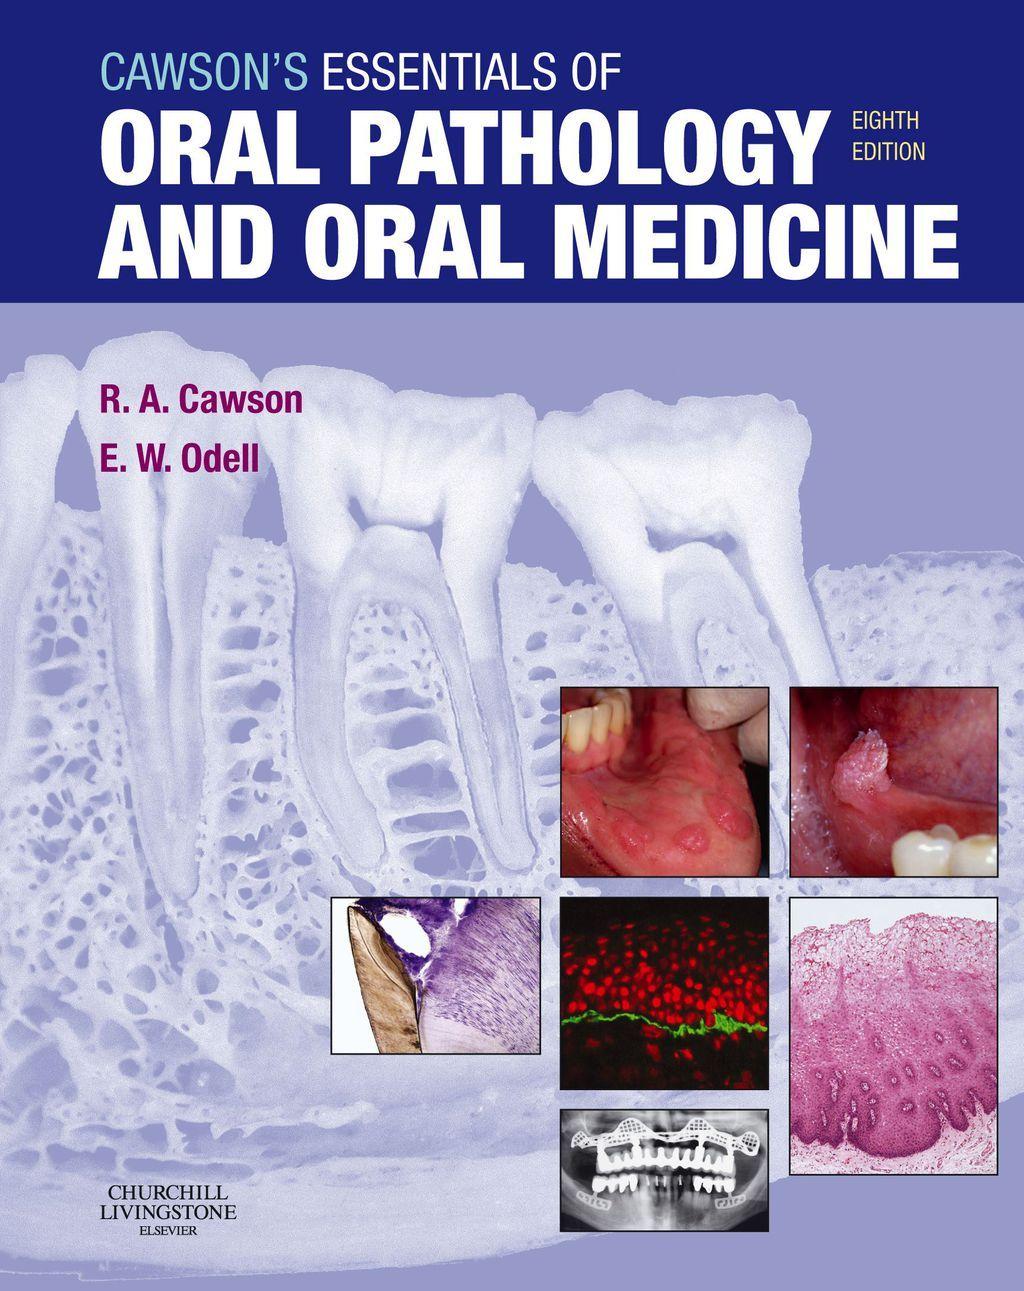 Cawson S Essentials Of Oral Pathology And Oral Medicine Ebook